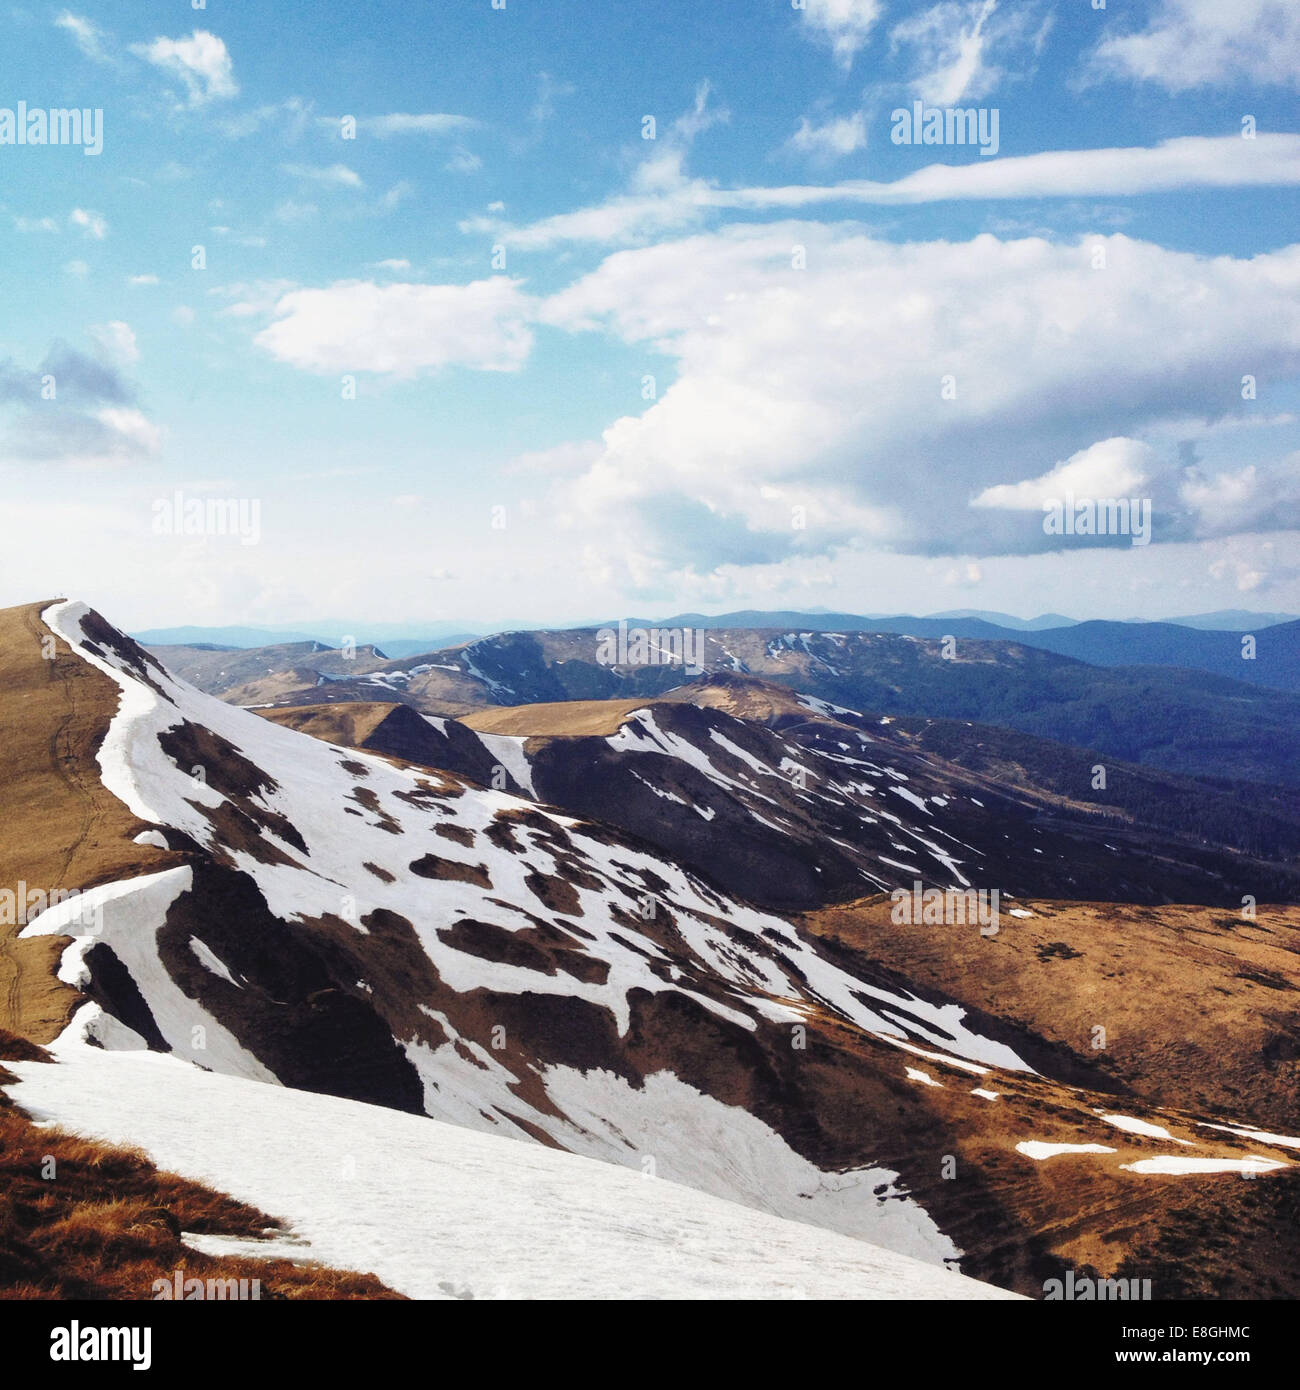 View of mountain range - Stock Image